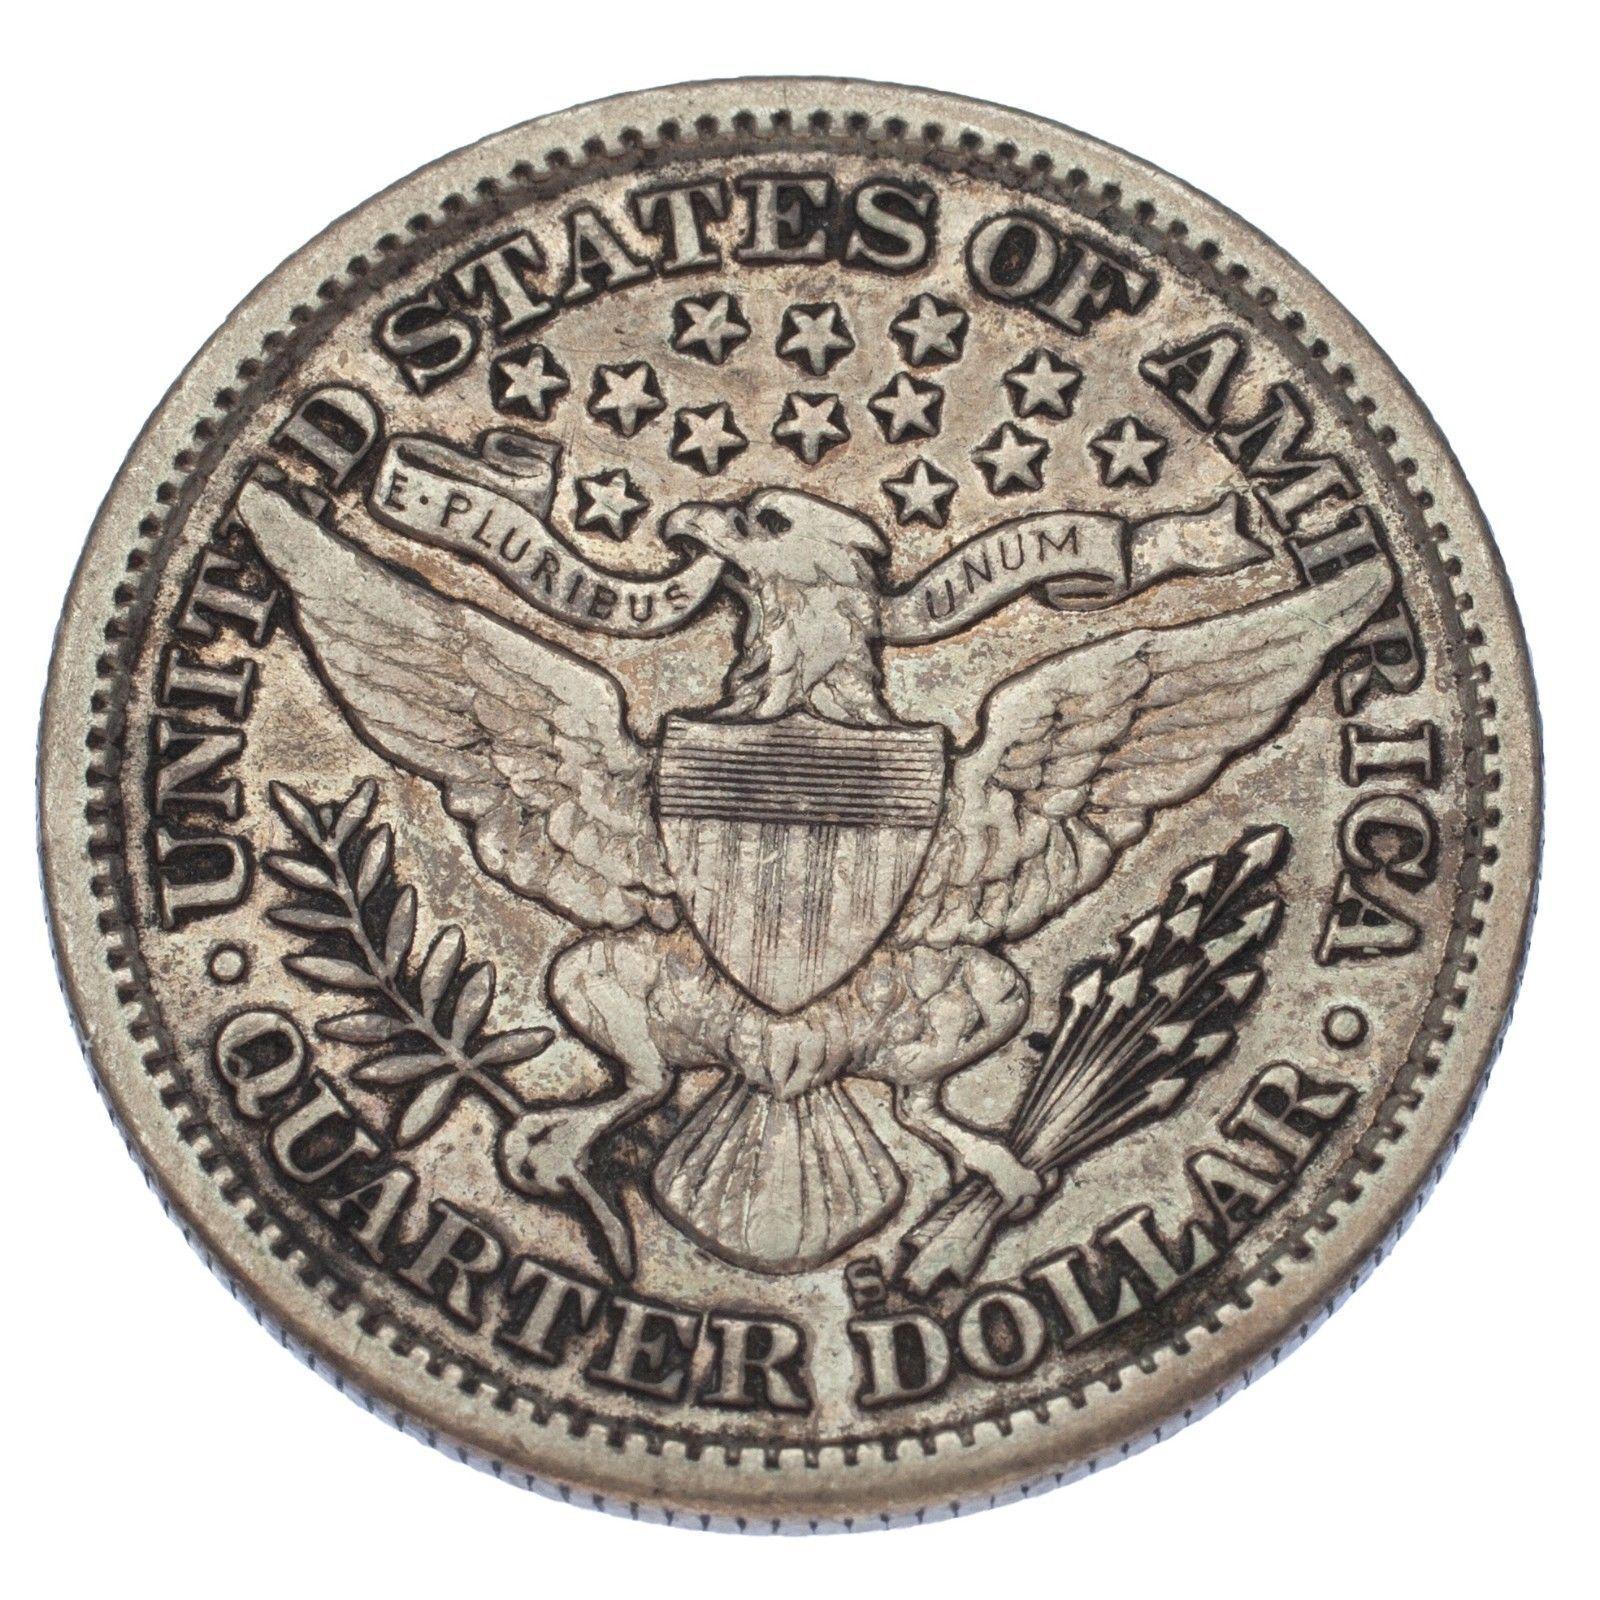 1897-S 25C Barber Quarter (Very Fine, VF Condition) image 4